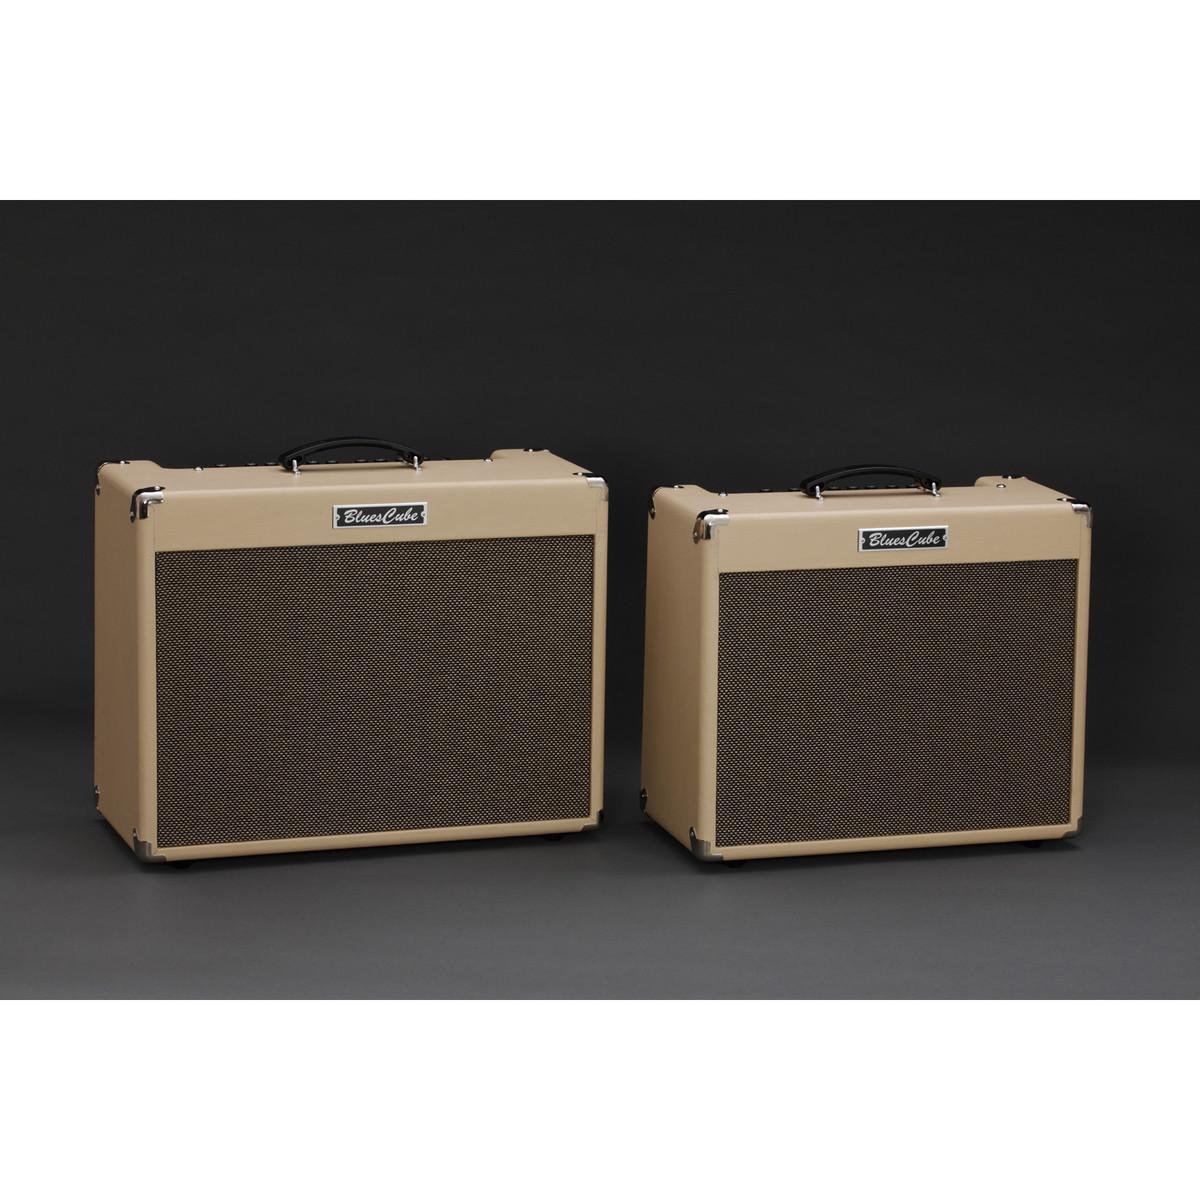 roland blues cube artist guitar amplifier cream b stock at. Black Bedroom Furniture Sets. Home Design Ideas